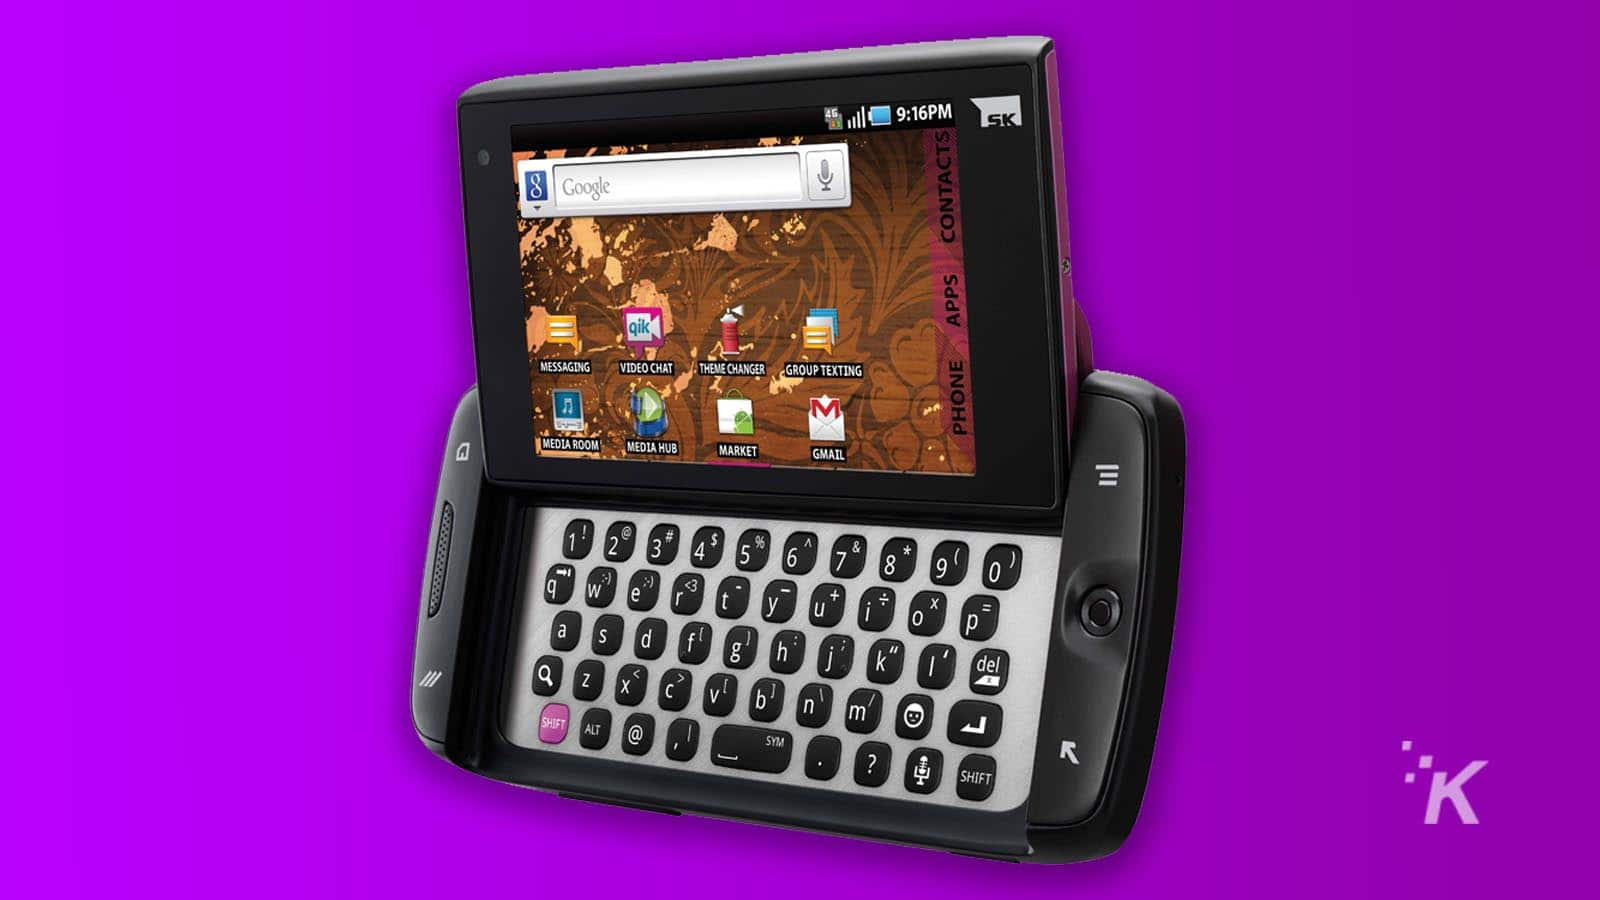 t-mobile sidekick phone